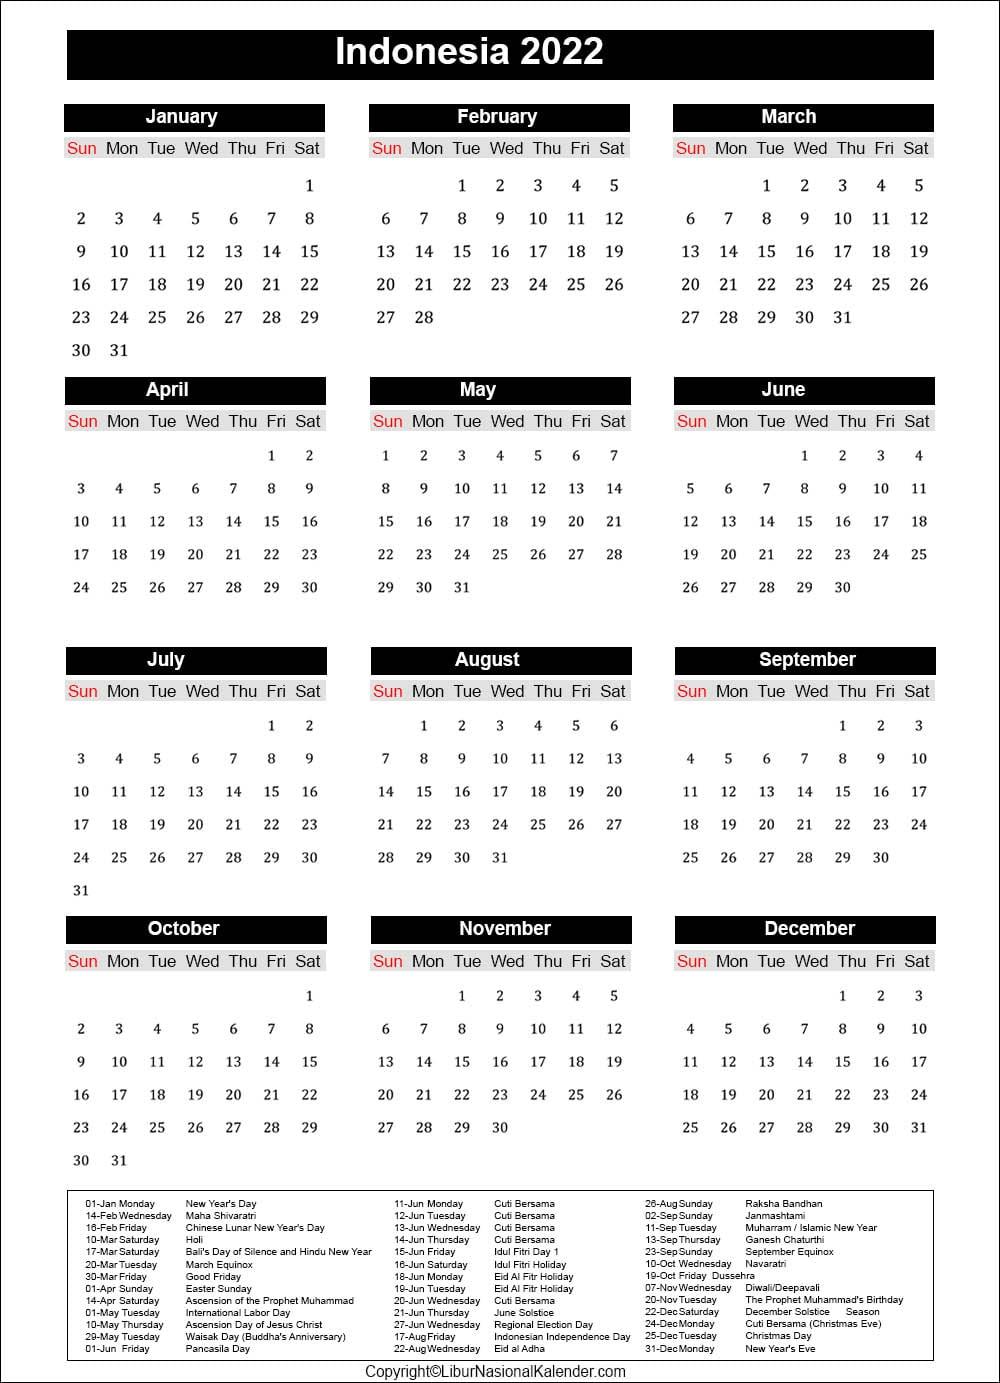 Calendar 2022 Indonesia | Public Holidays 2022